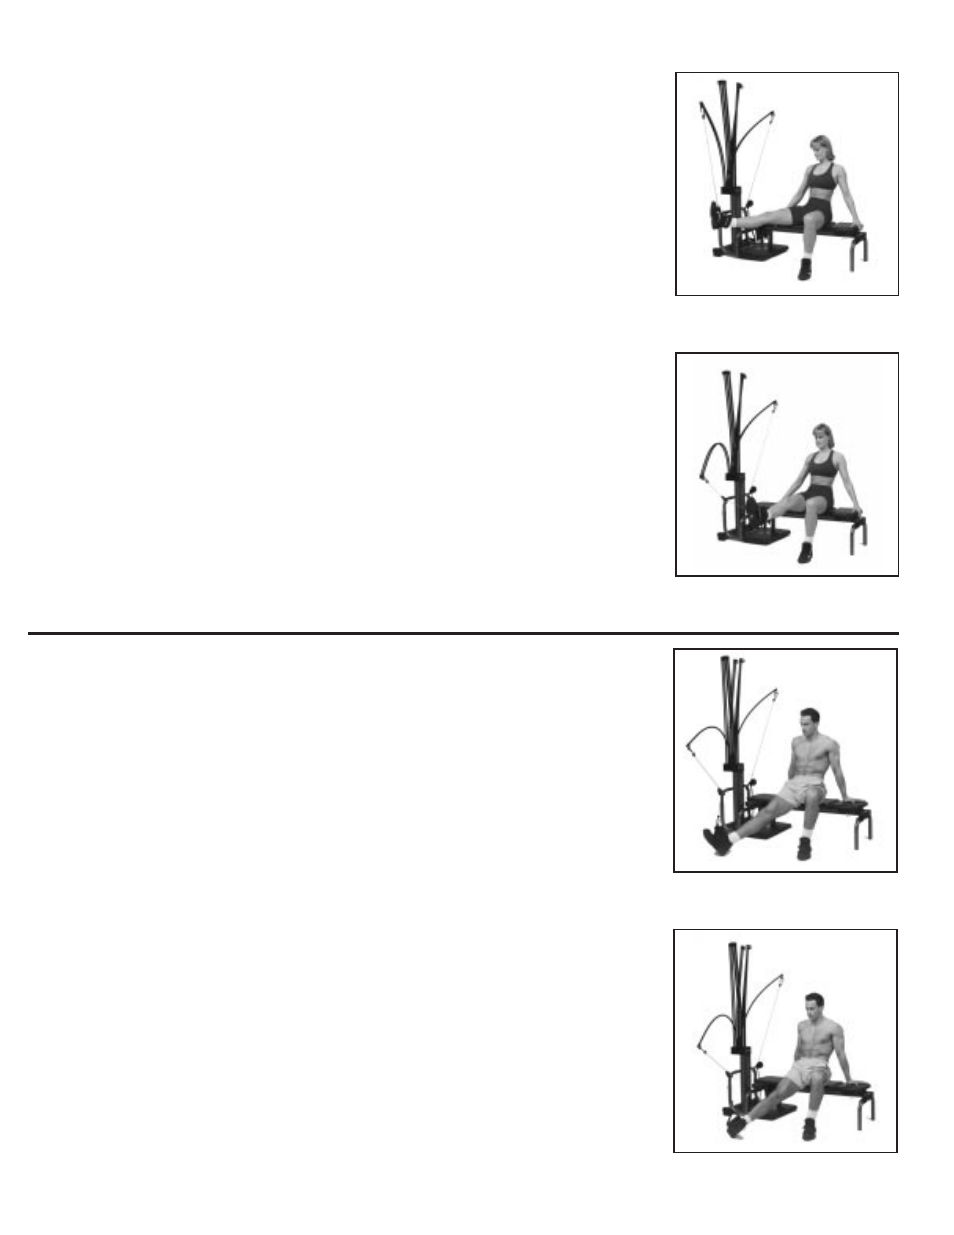 Leg Exercises Bowflex Xtl User Manual Page 53 80